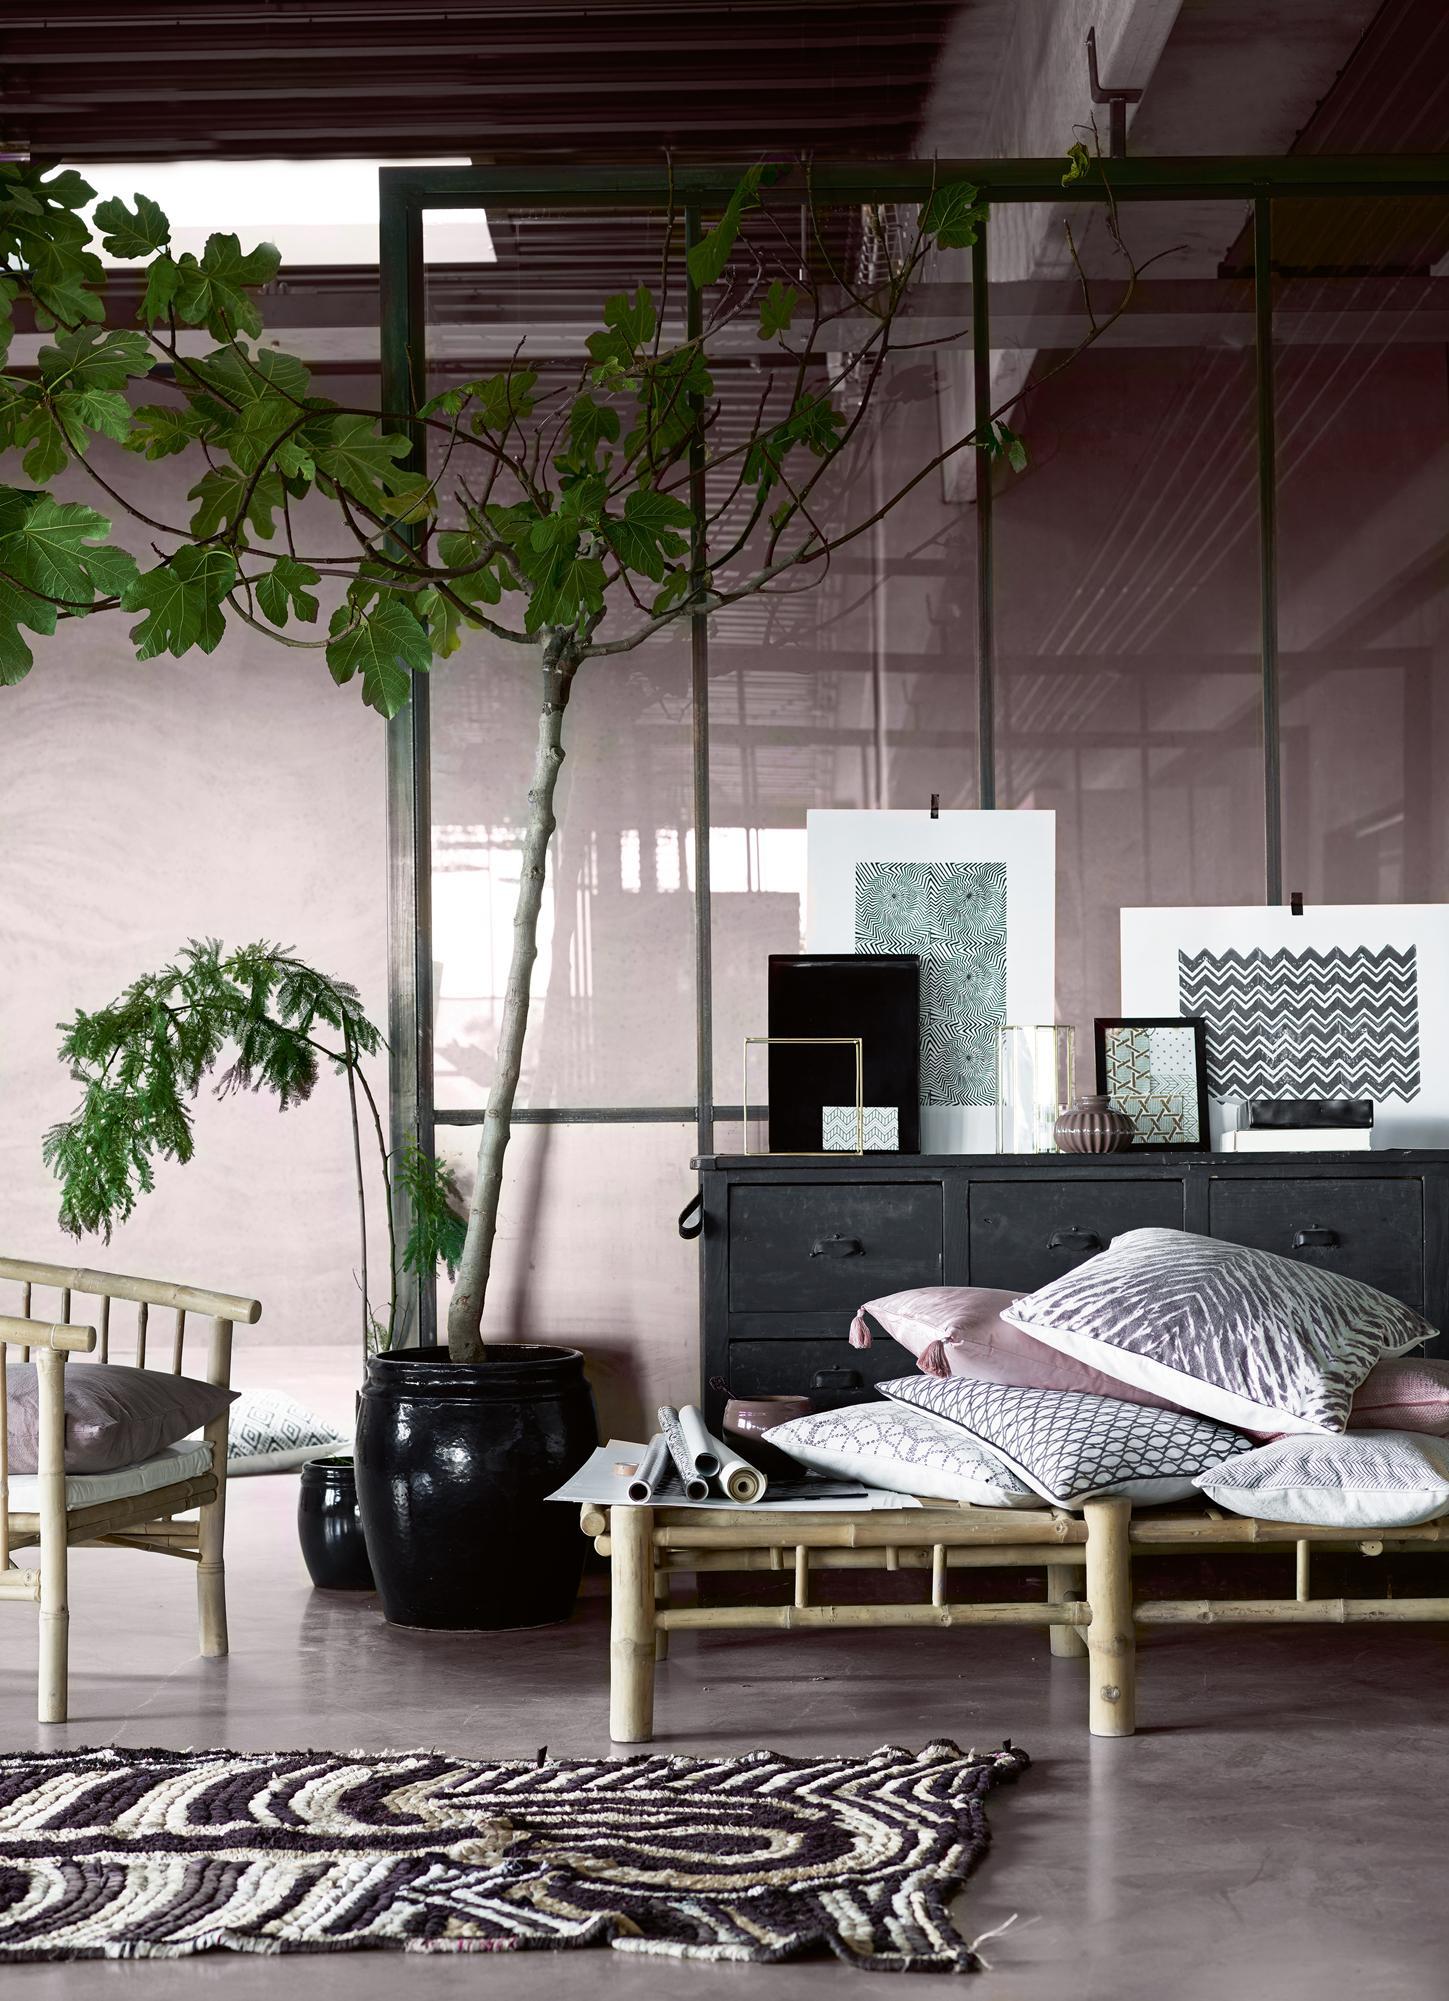 trennwand wohnzimmer excellent trennwand regal raumteiler regale trennwand regal als with. Black Bedroom Furniture Sets. Home Design Ideas